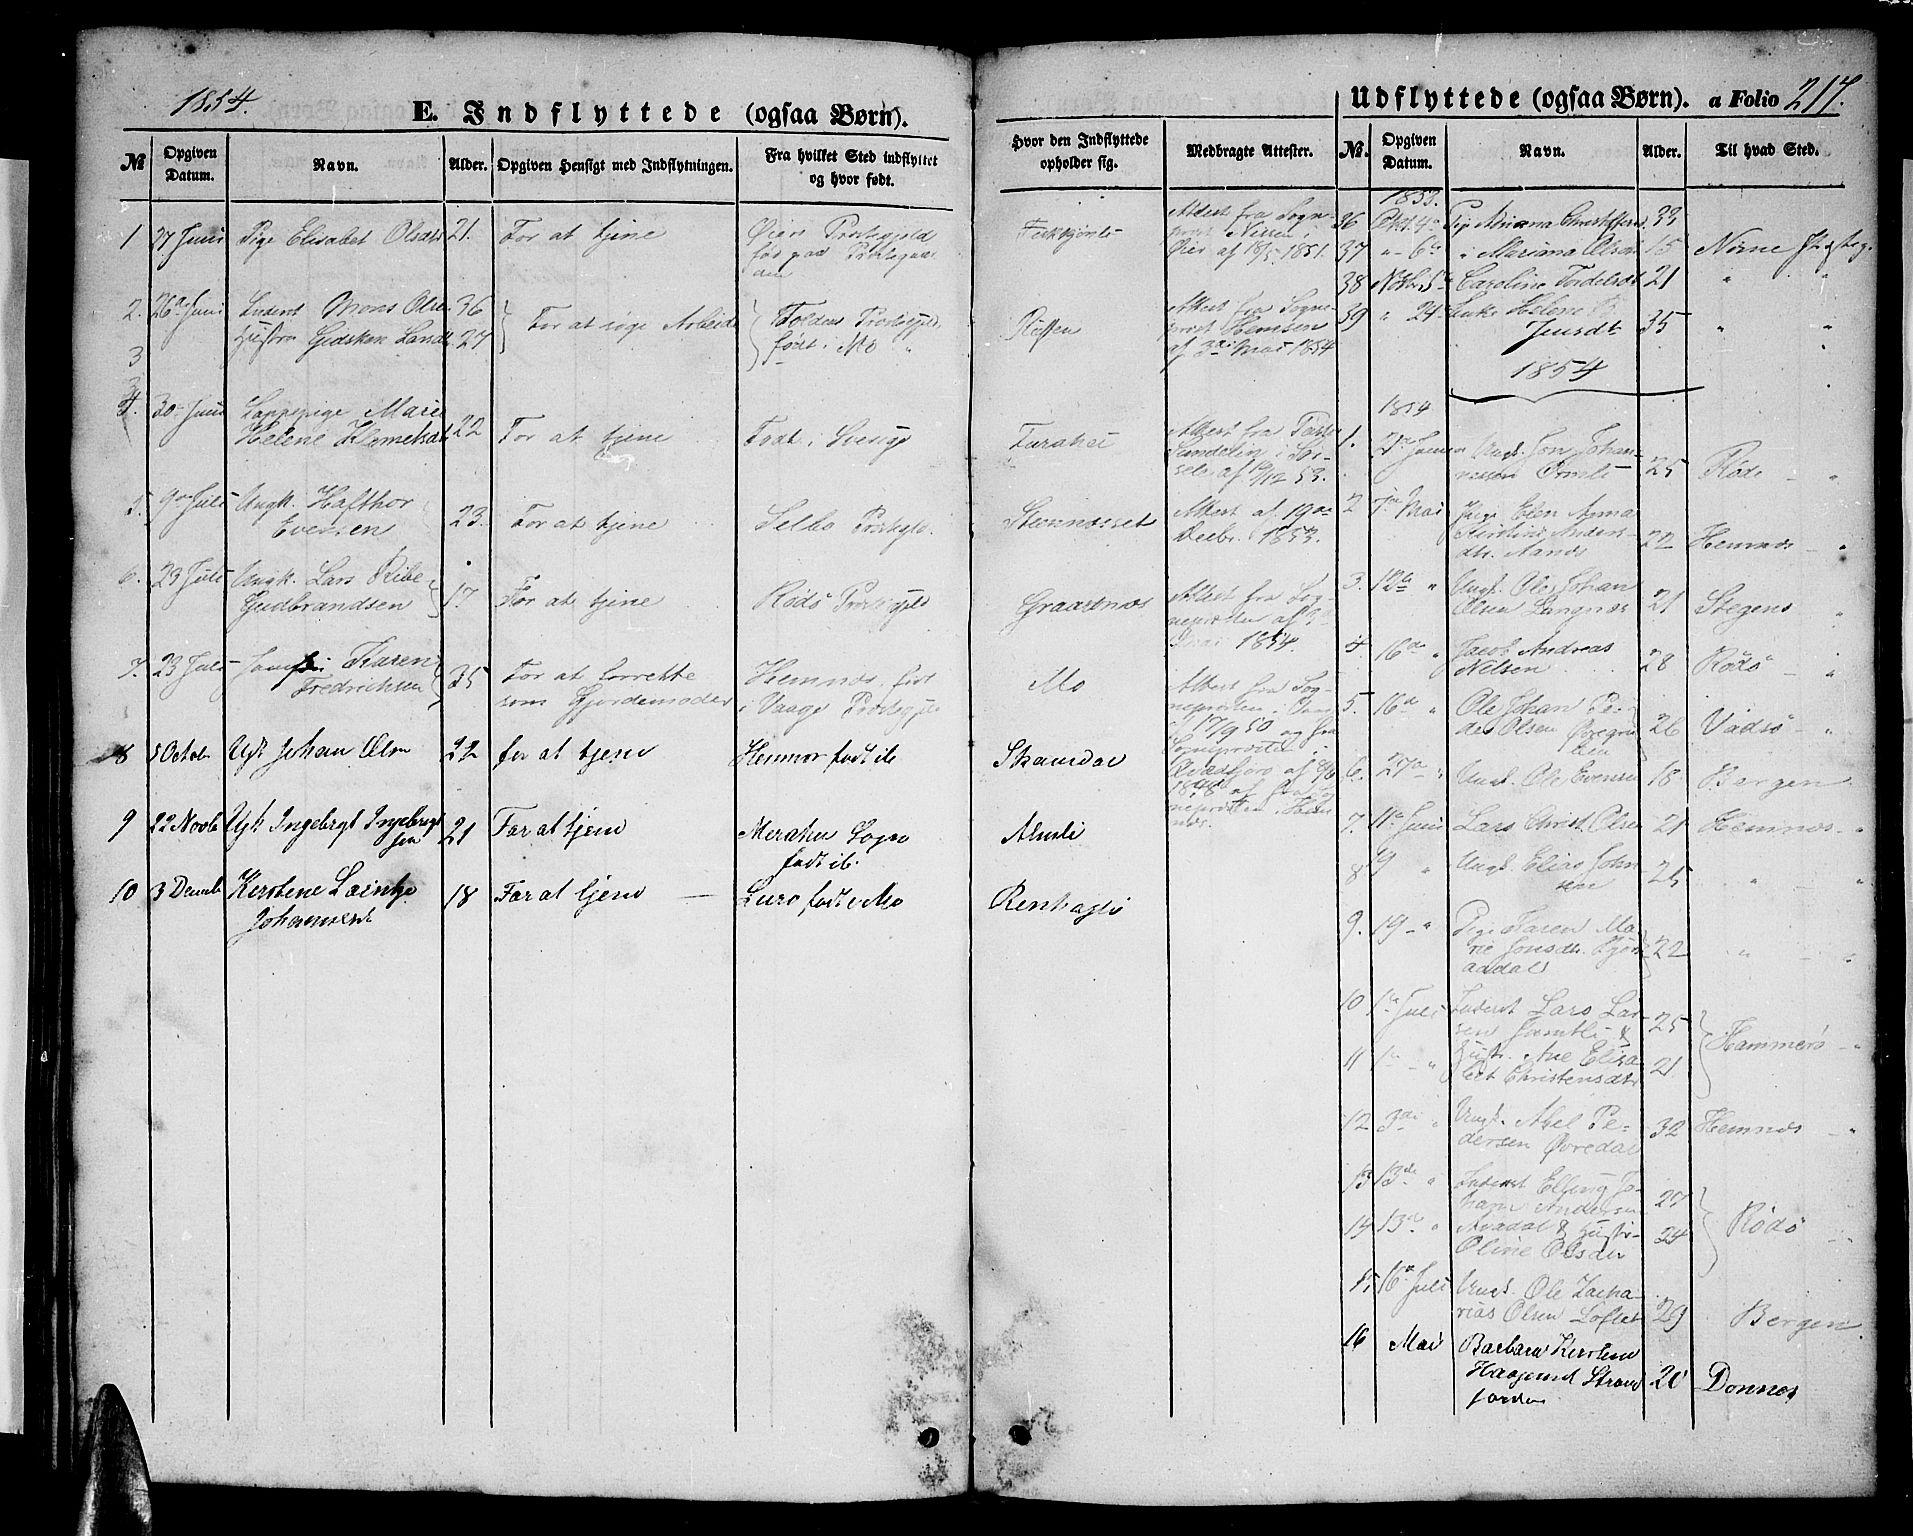 SAT, Ministerialprotokoller, klokkerbøker og fødselsregistre - Nordland, 827/L0414: Klokkerbok nr. 827C03, 1853-1865, s. 217